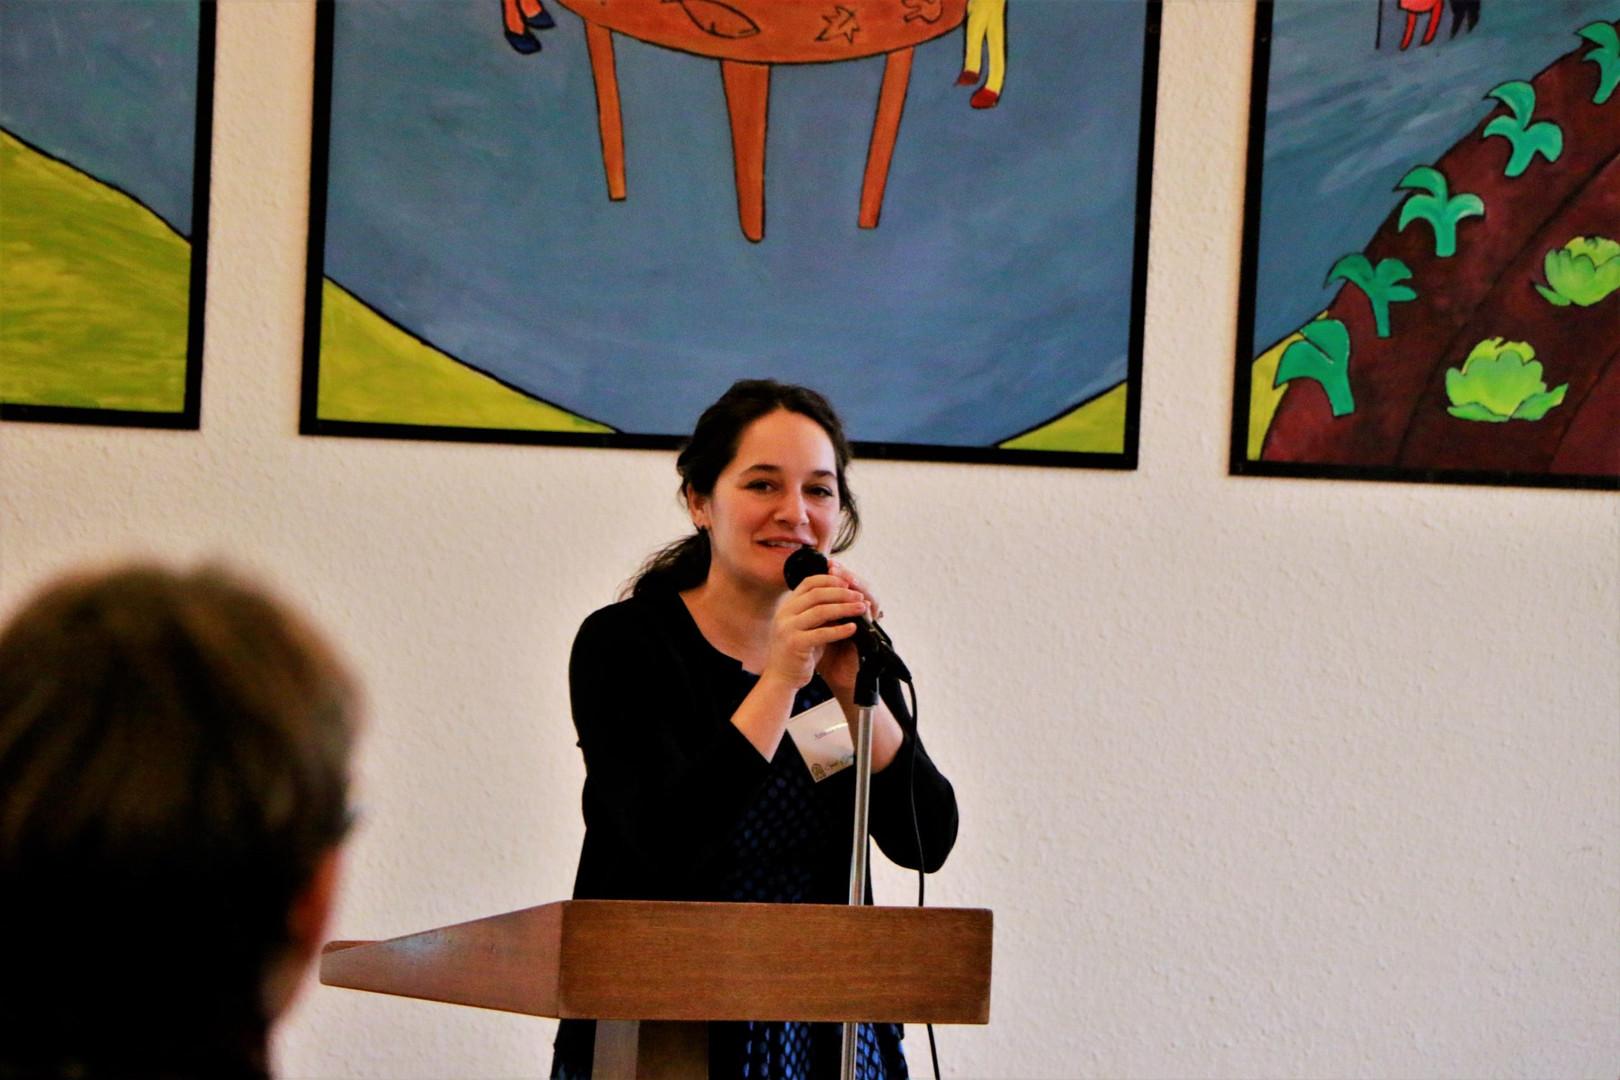 Amelia speaking stage.jpg